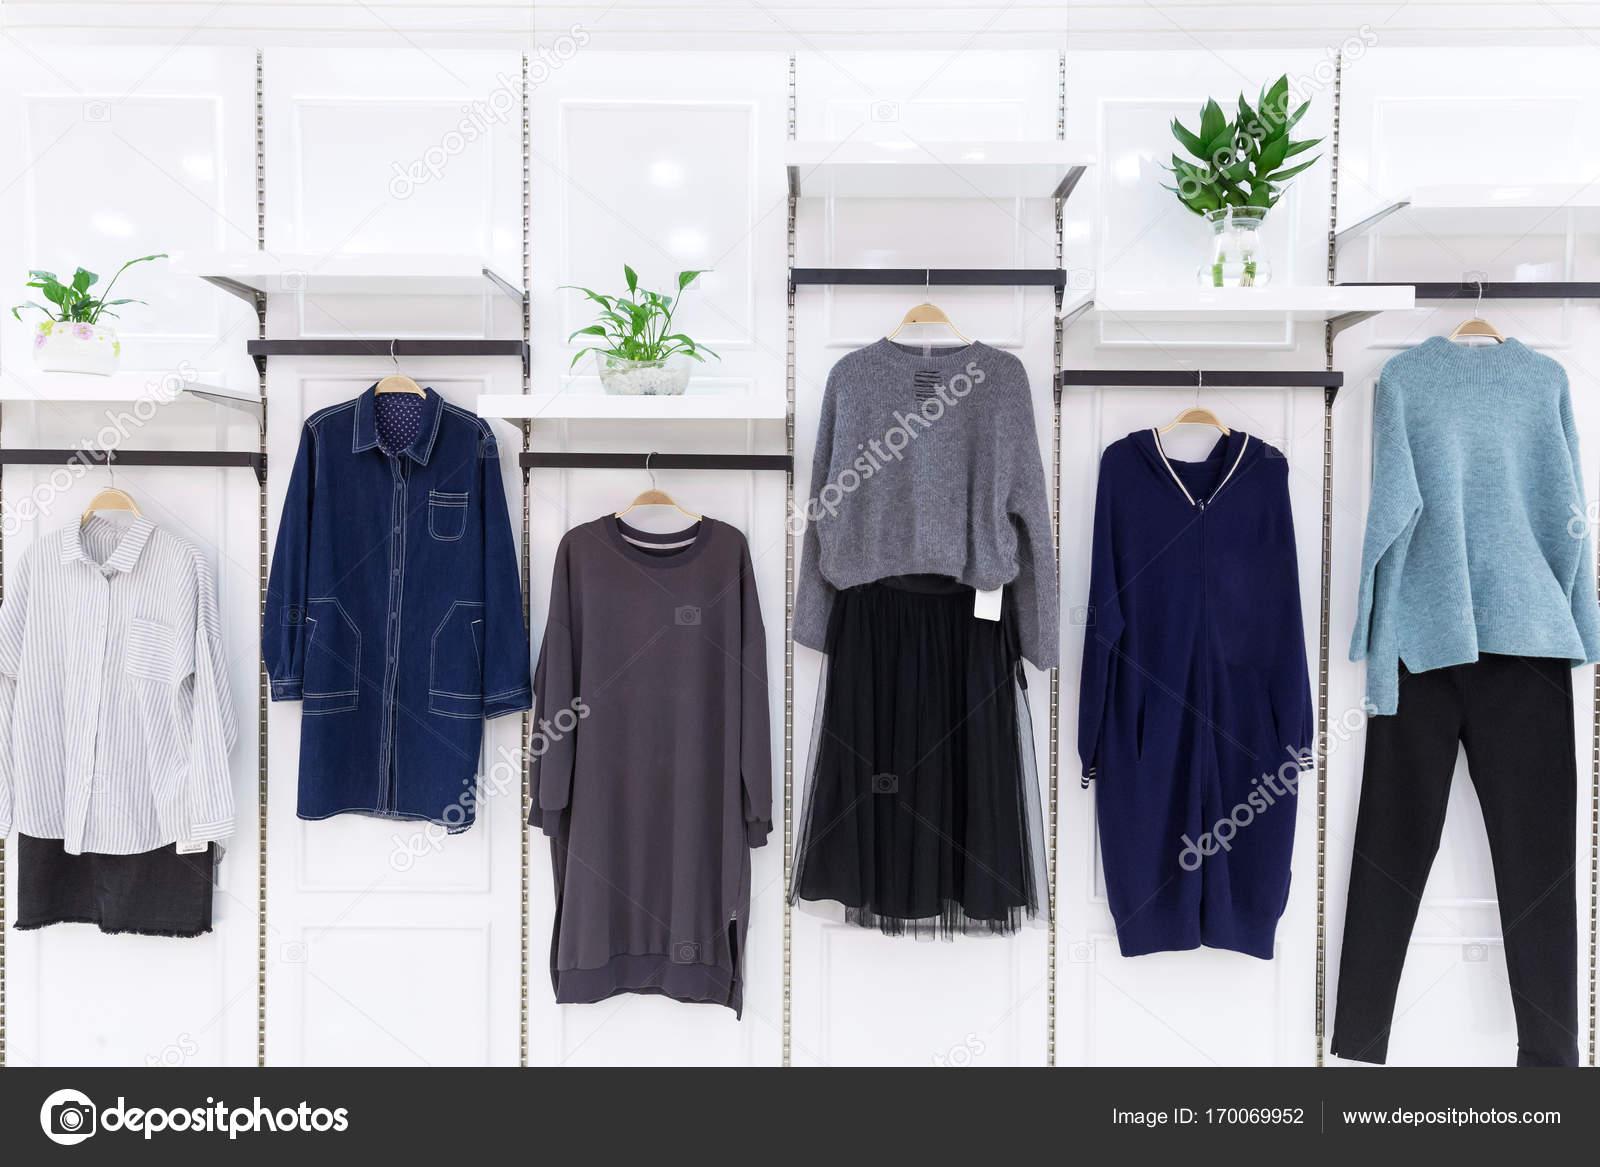 Nieuwe Kleding Mode.Nieuwe Mode Kleding In Winkelcentrum Stockfoto C Zhudifeng 170069952